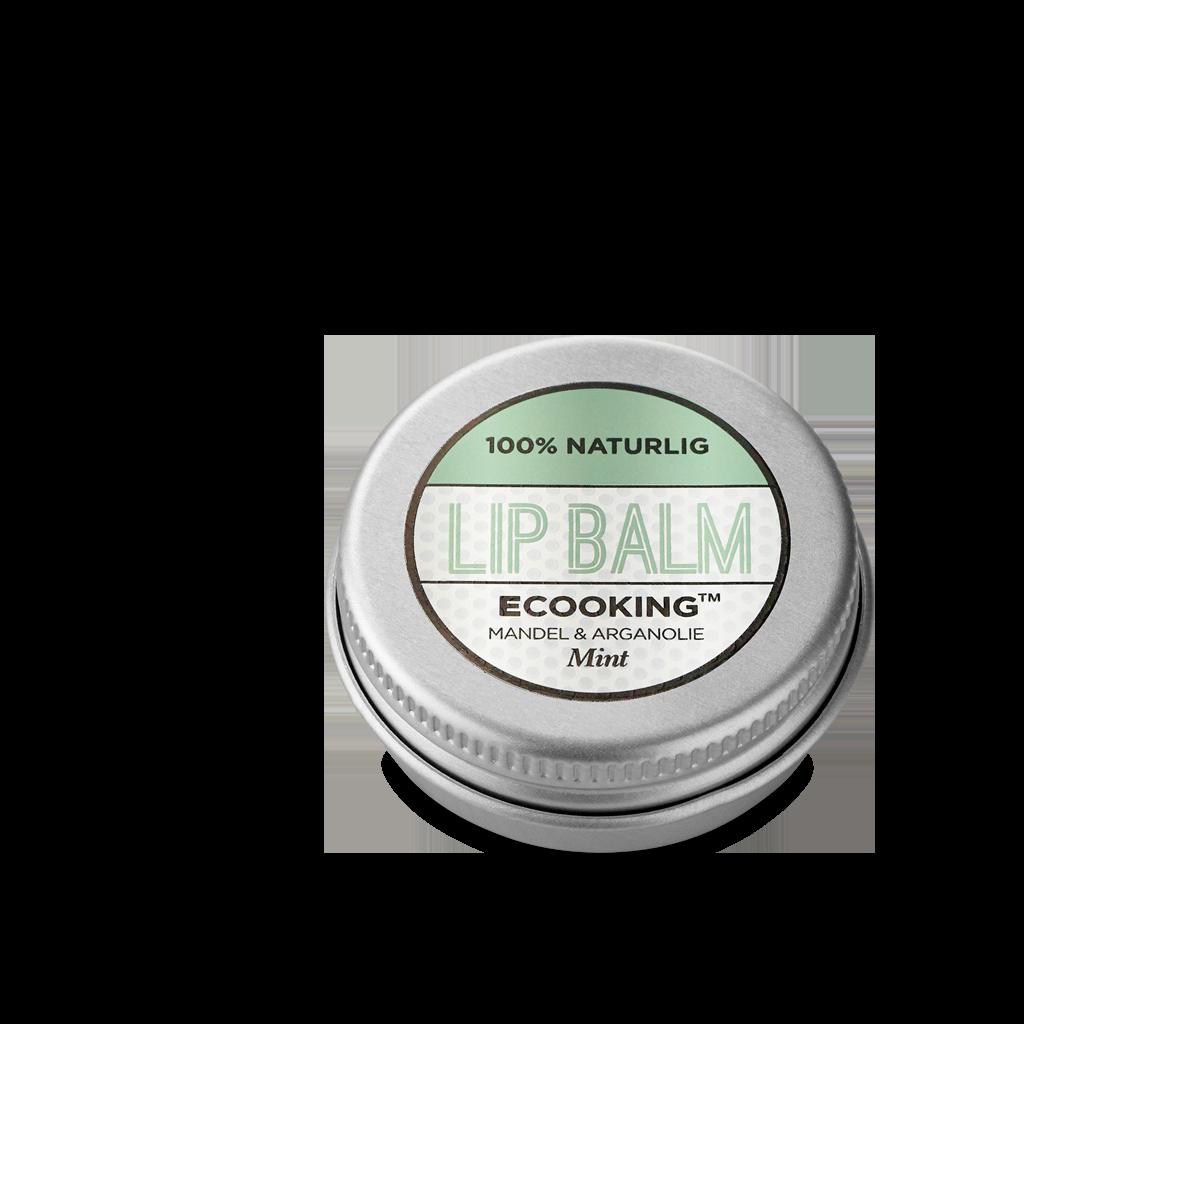 Ecooking Lip Balm Mint